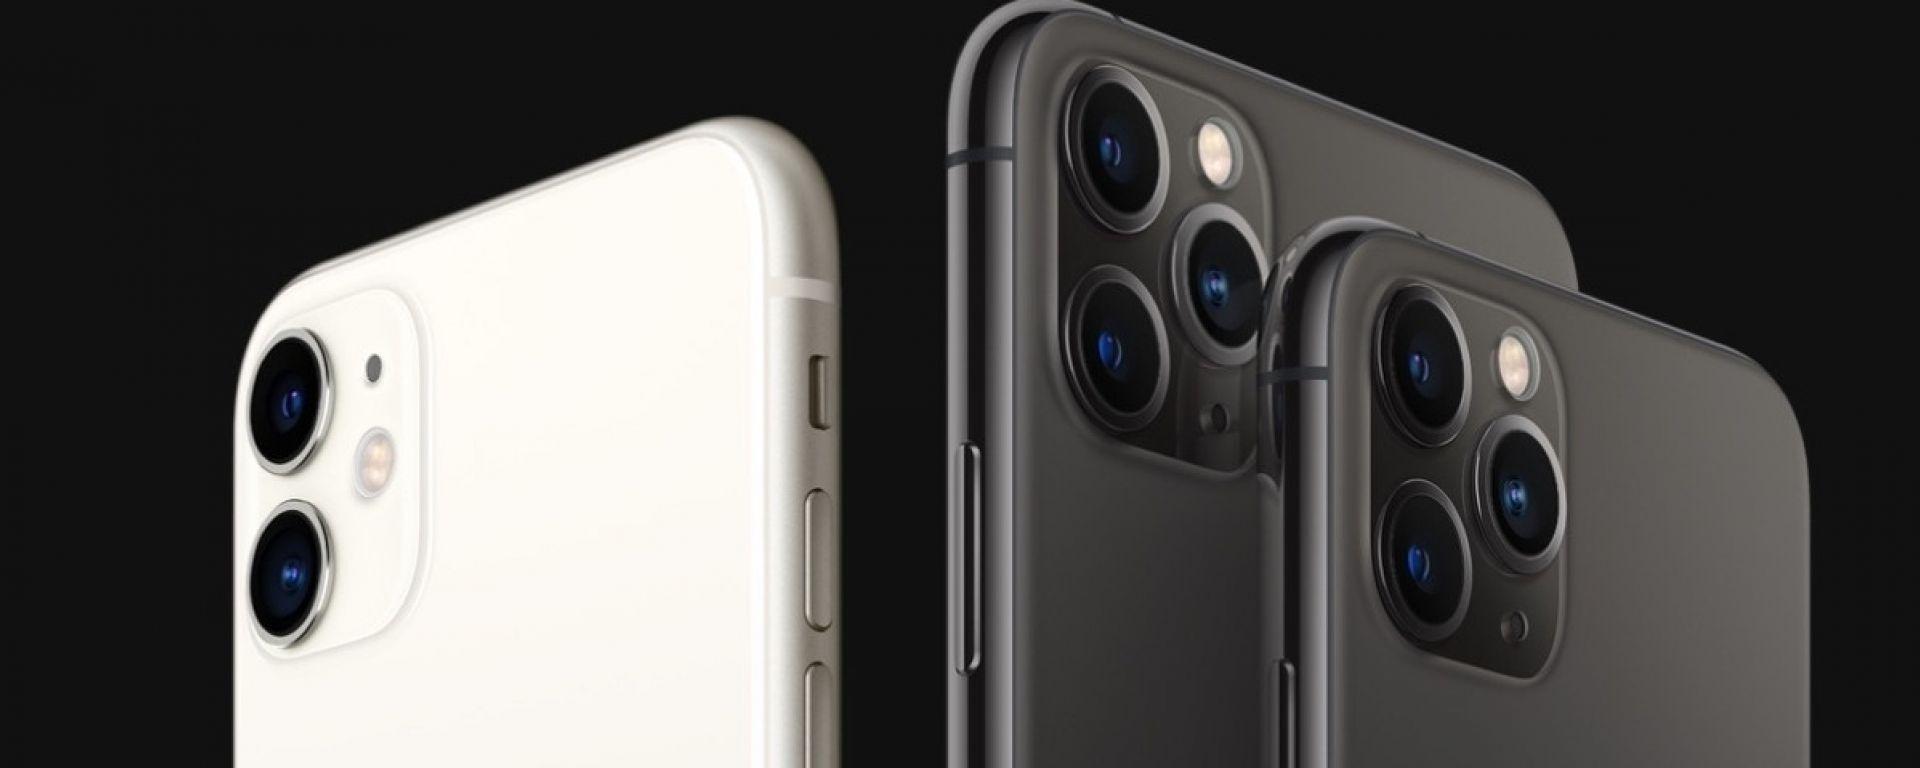 Nuovi iPhone 11, iPhone 11 Pro e iPhone 11 Pro Max